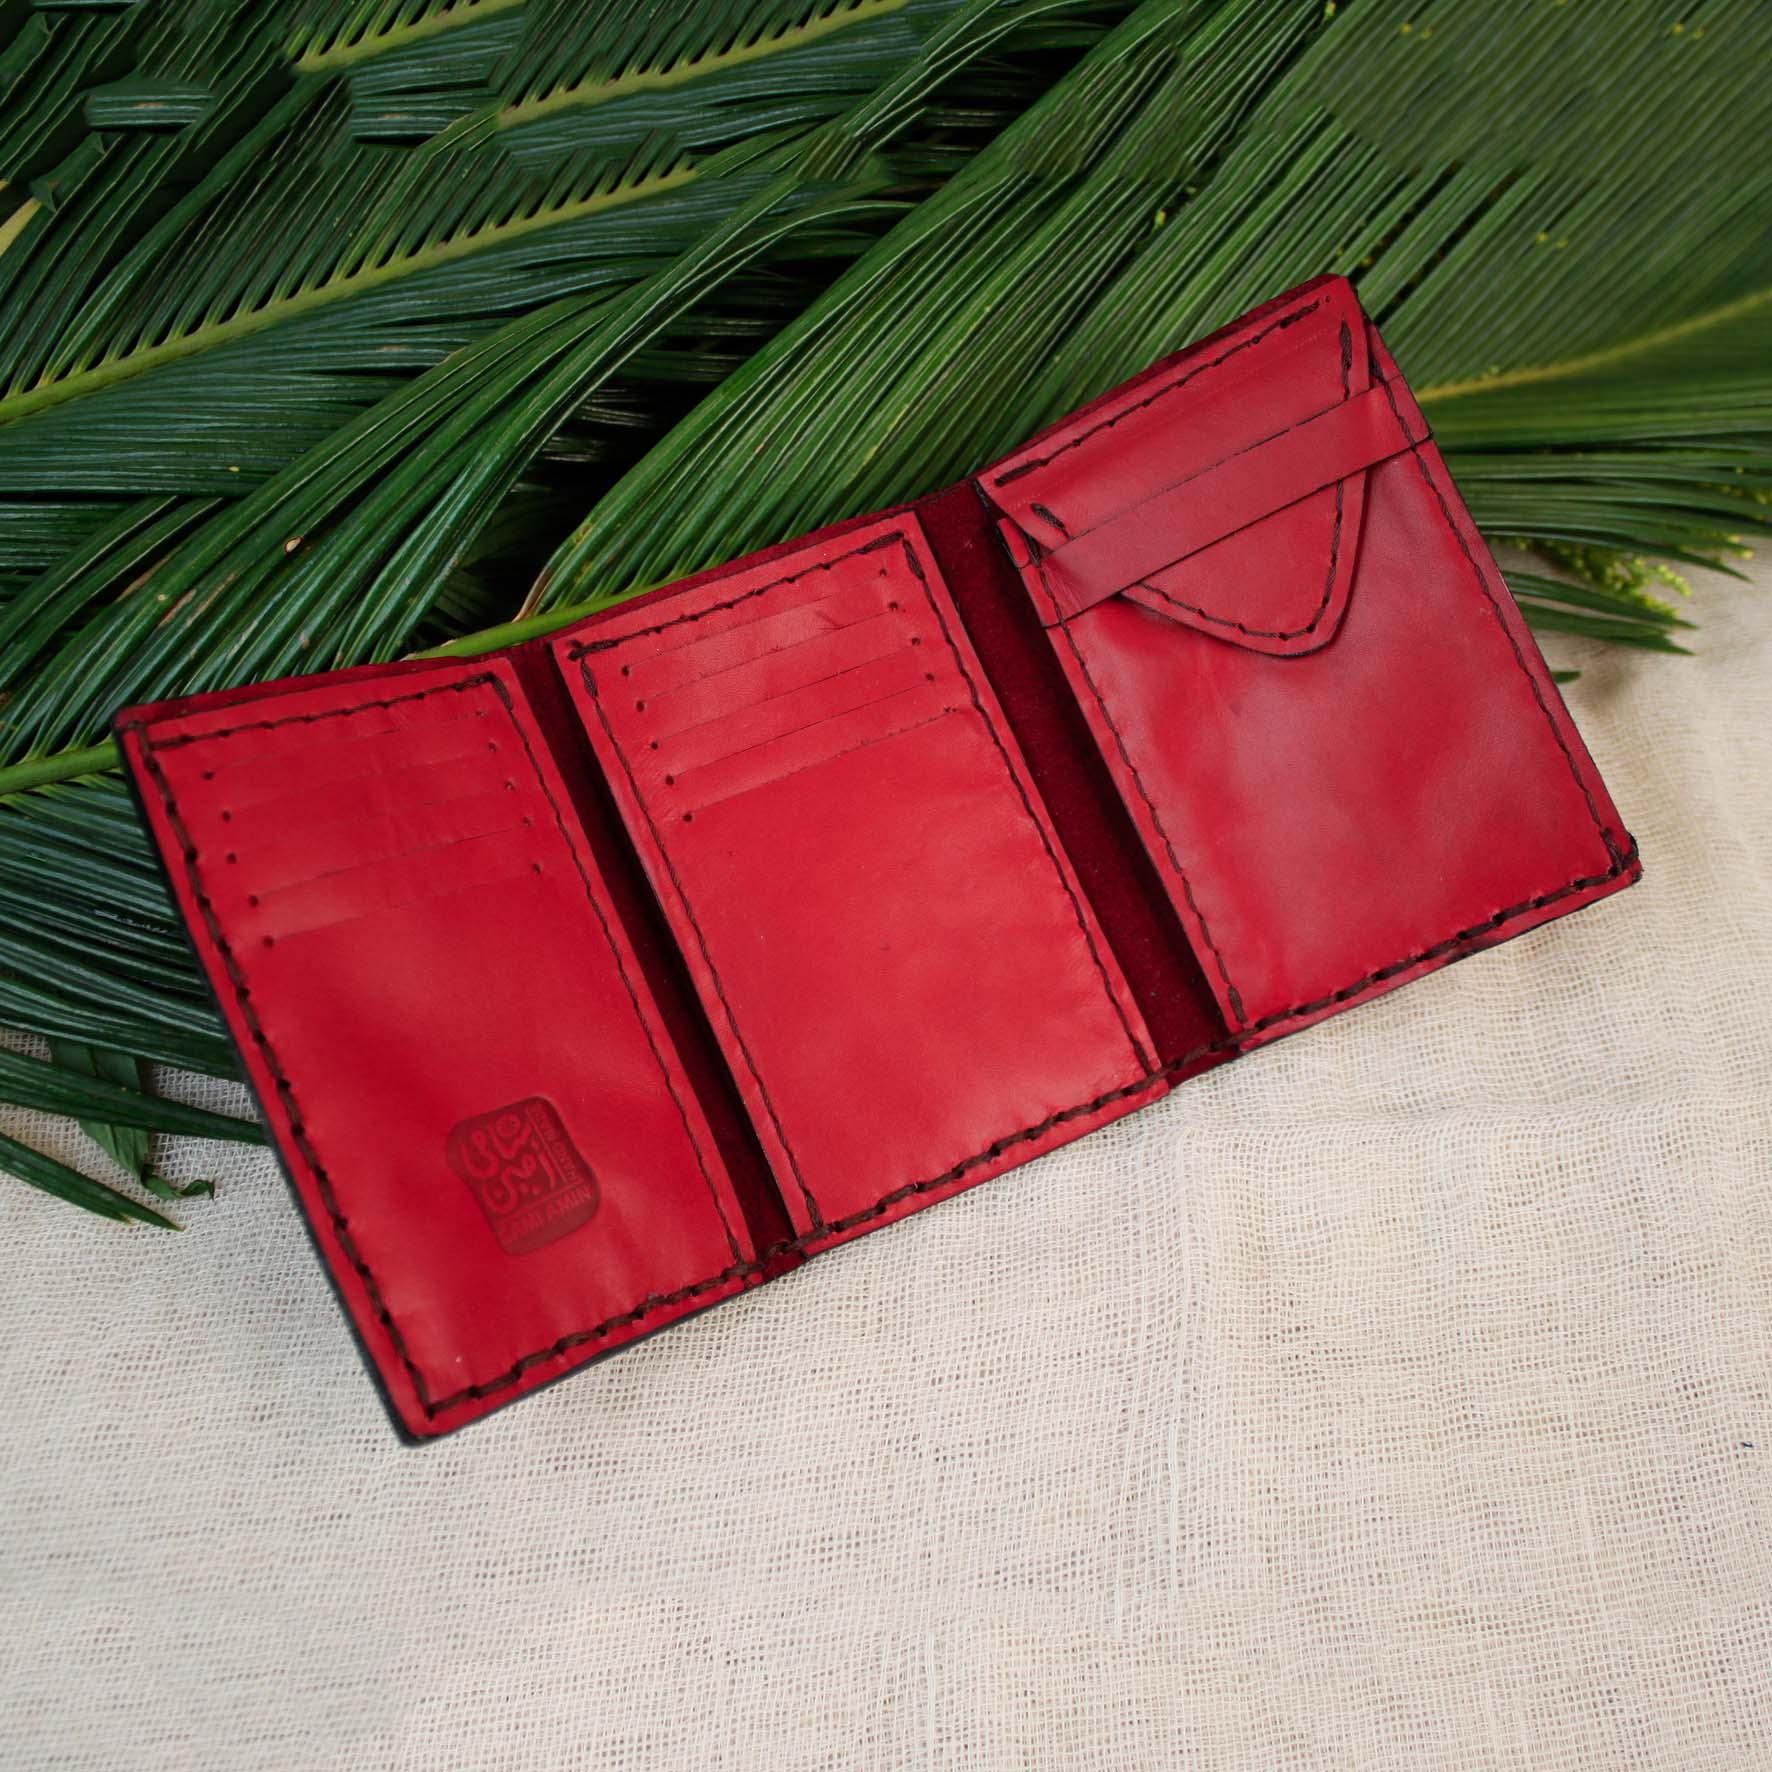 Large Tree Leaf Wallet